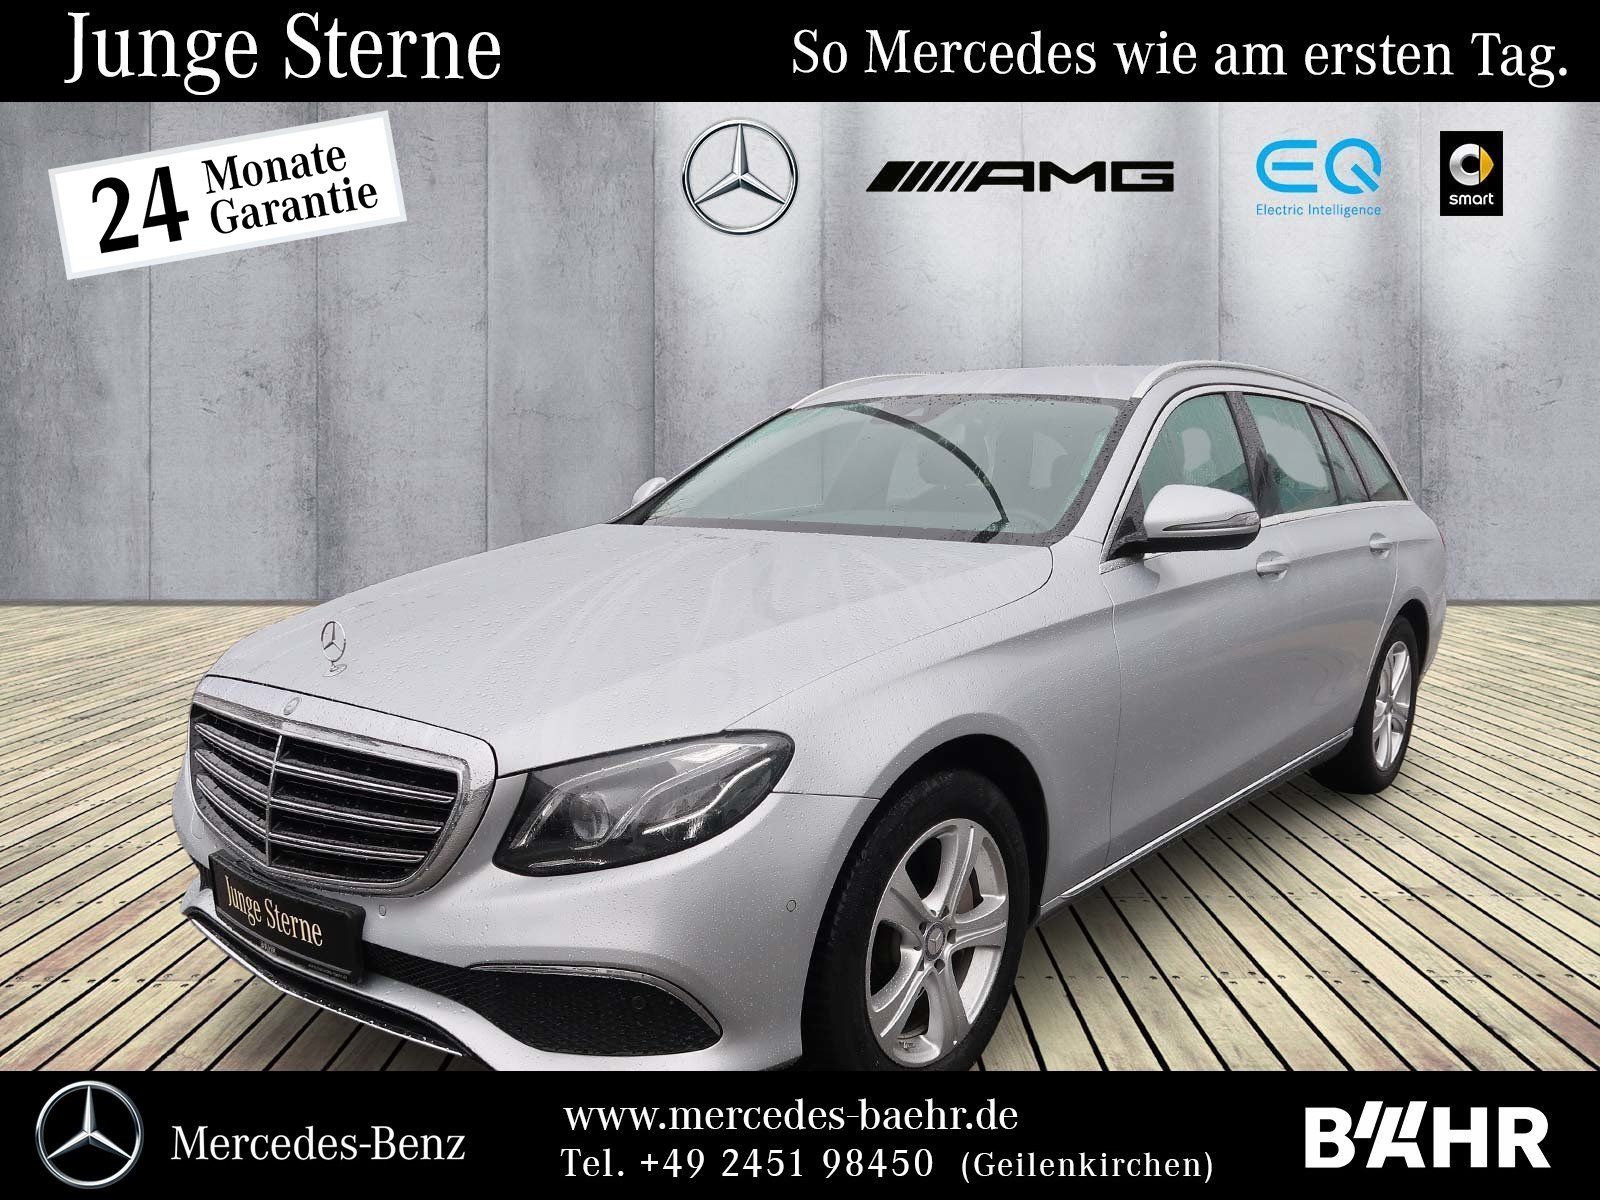 Mercedes-Benz E 350 d T Exclusive/Comand/Multibeam/Widescreen, Jahr 2017, Diesel